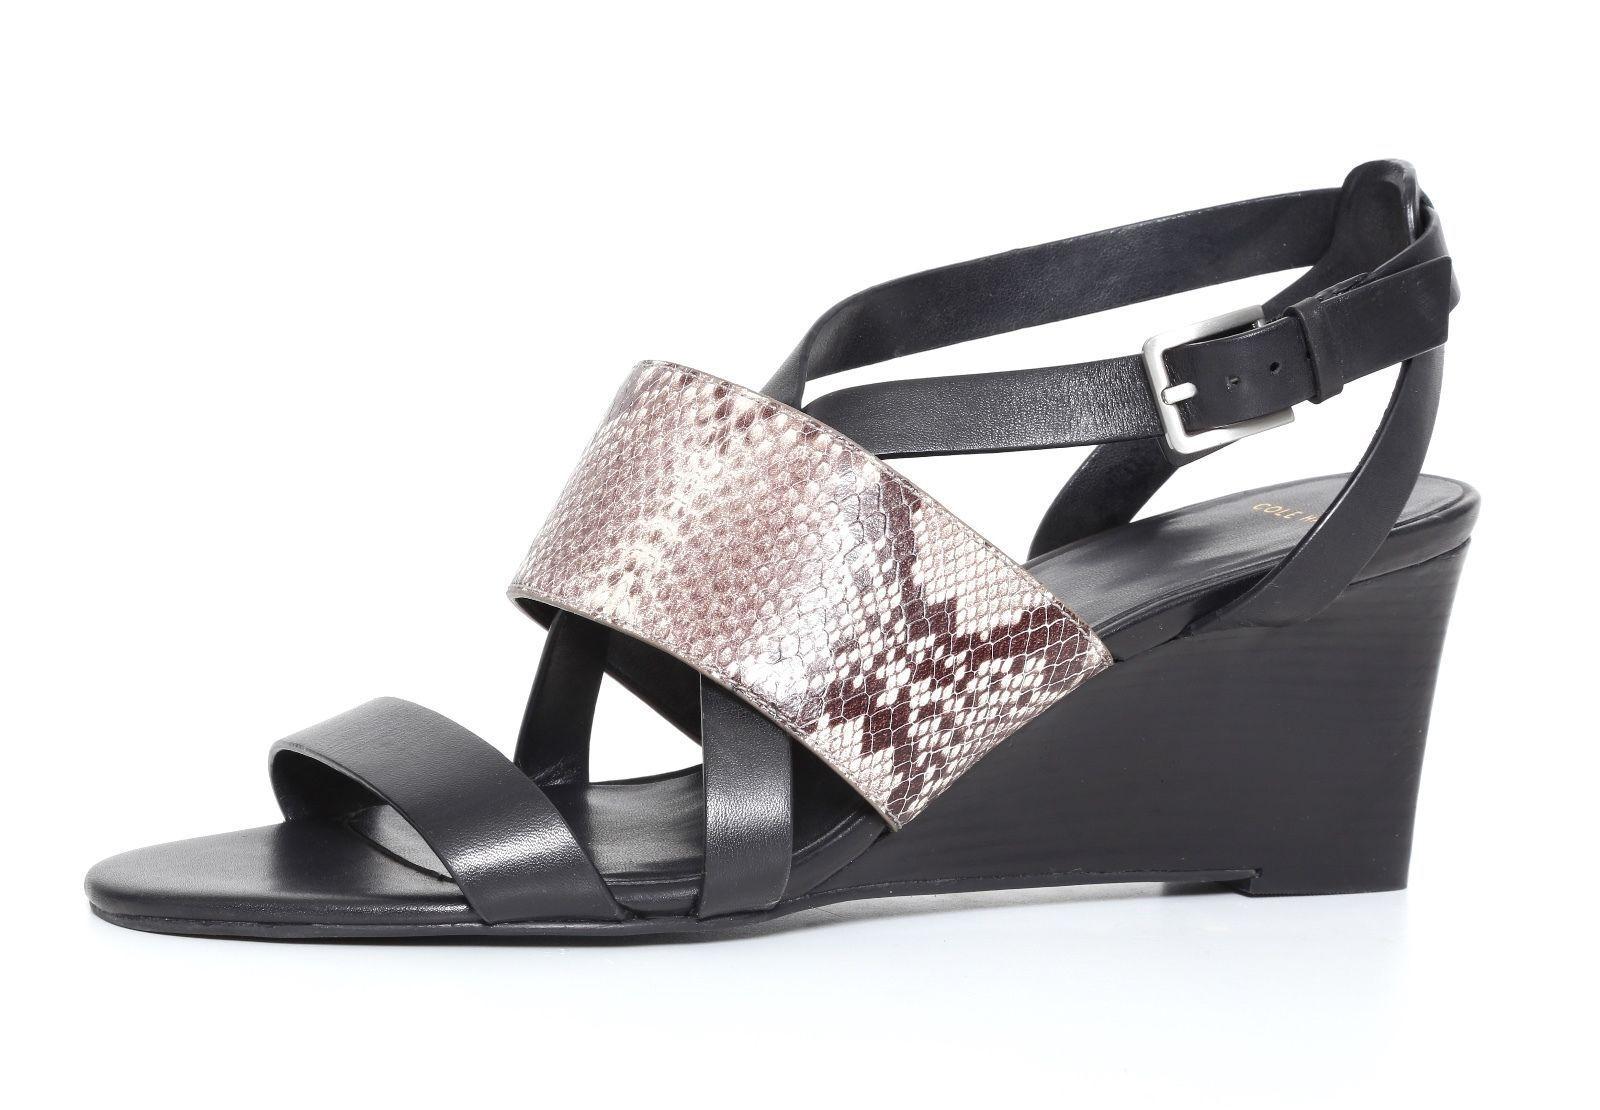 Cole Haan Snake Embossed Pelle Wedge Sandal Donna Size 6 B 3127